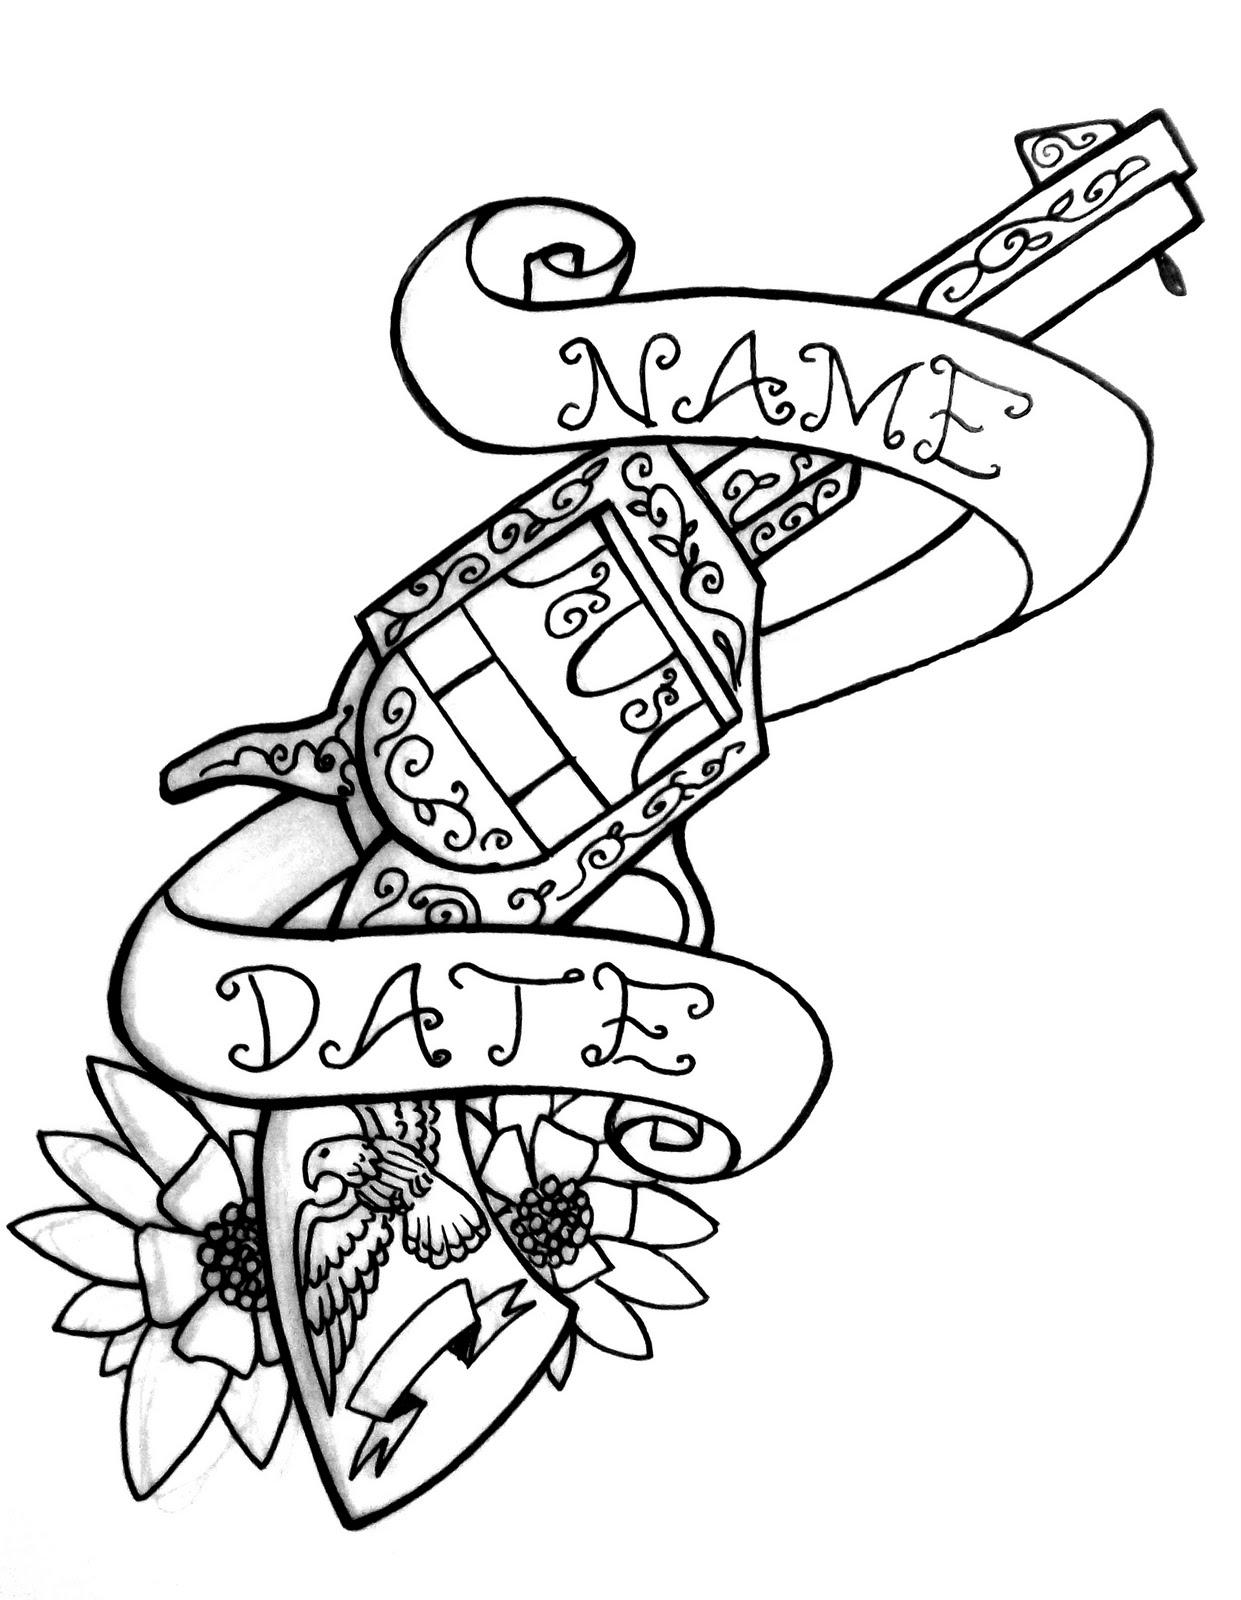 1241x1600 30 Random Tattoo Designs In 30 Days 09 10 2010